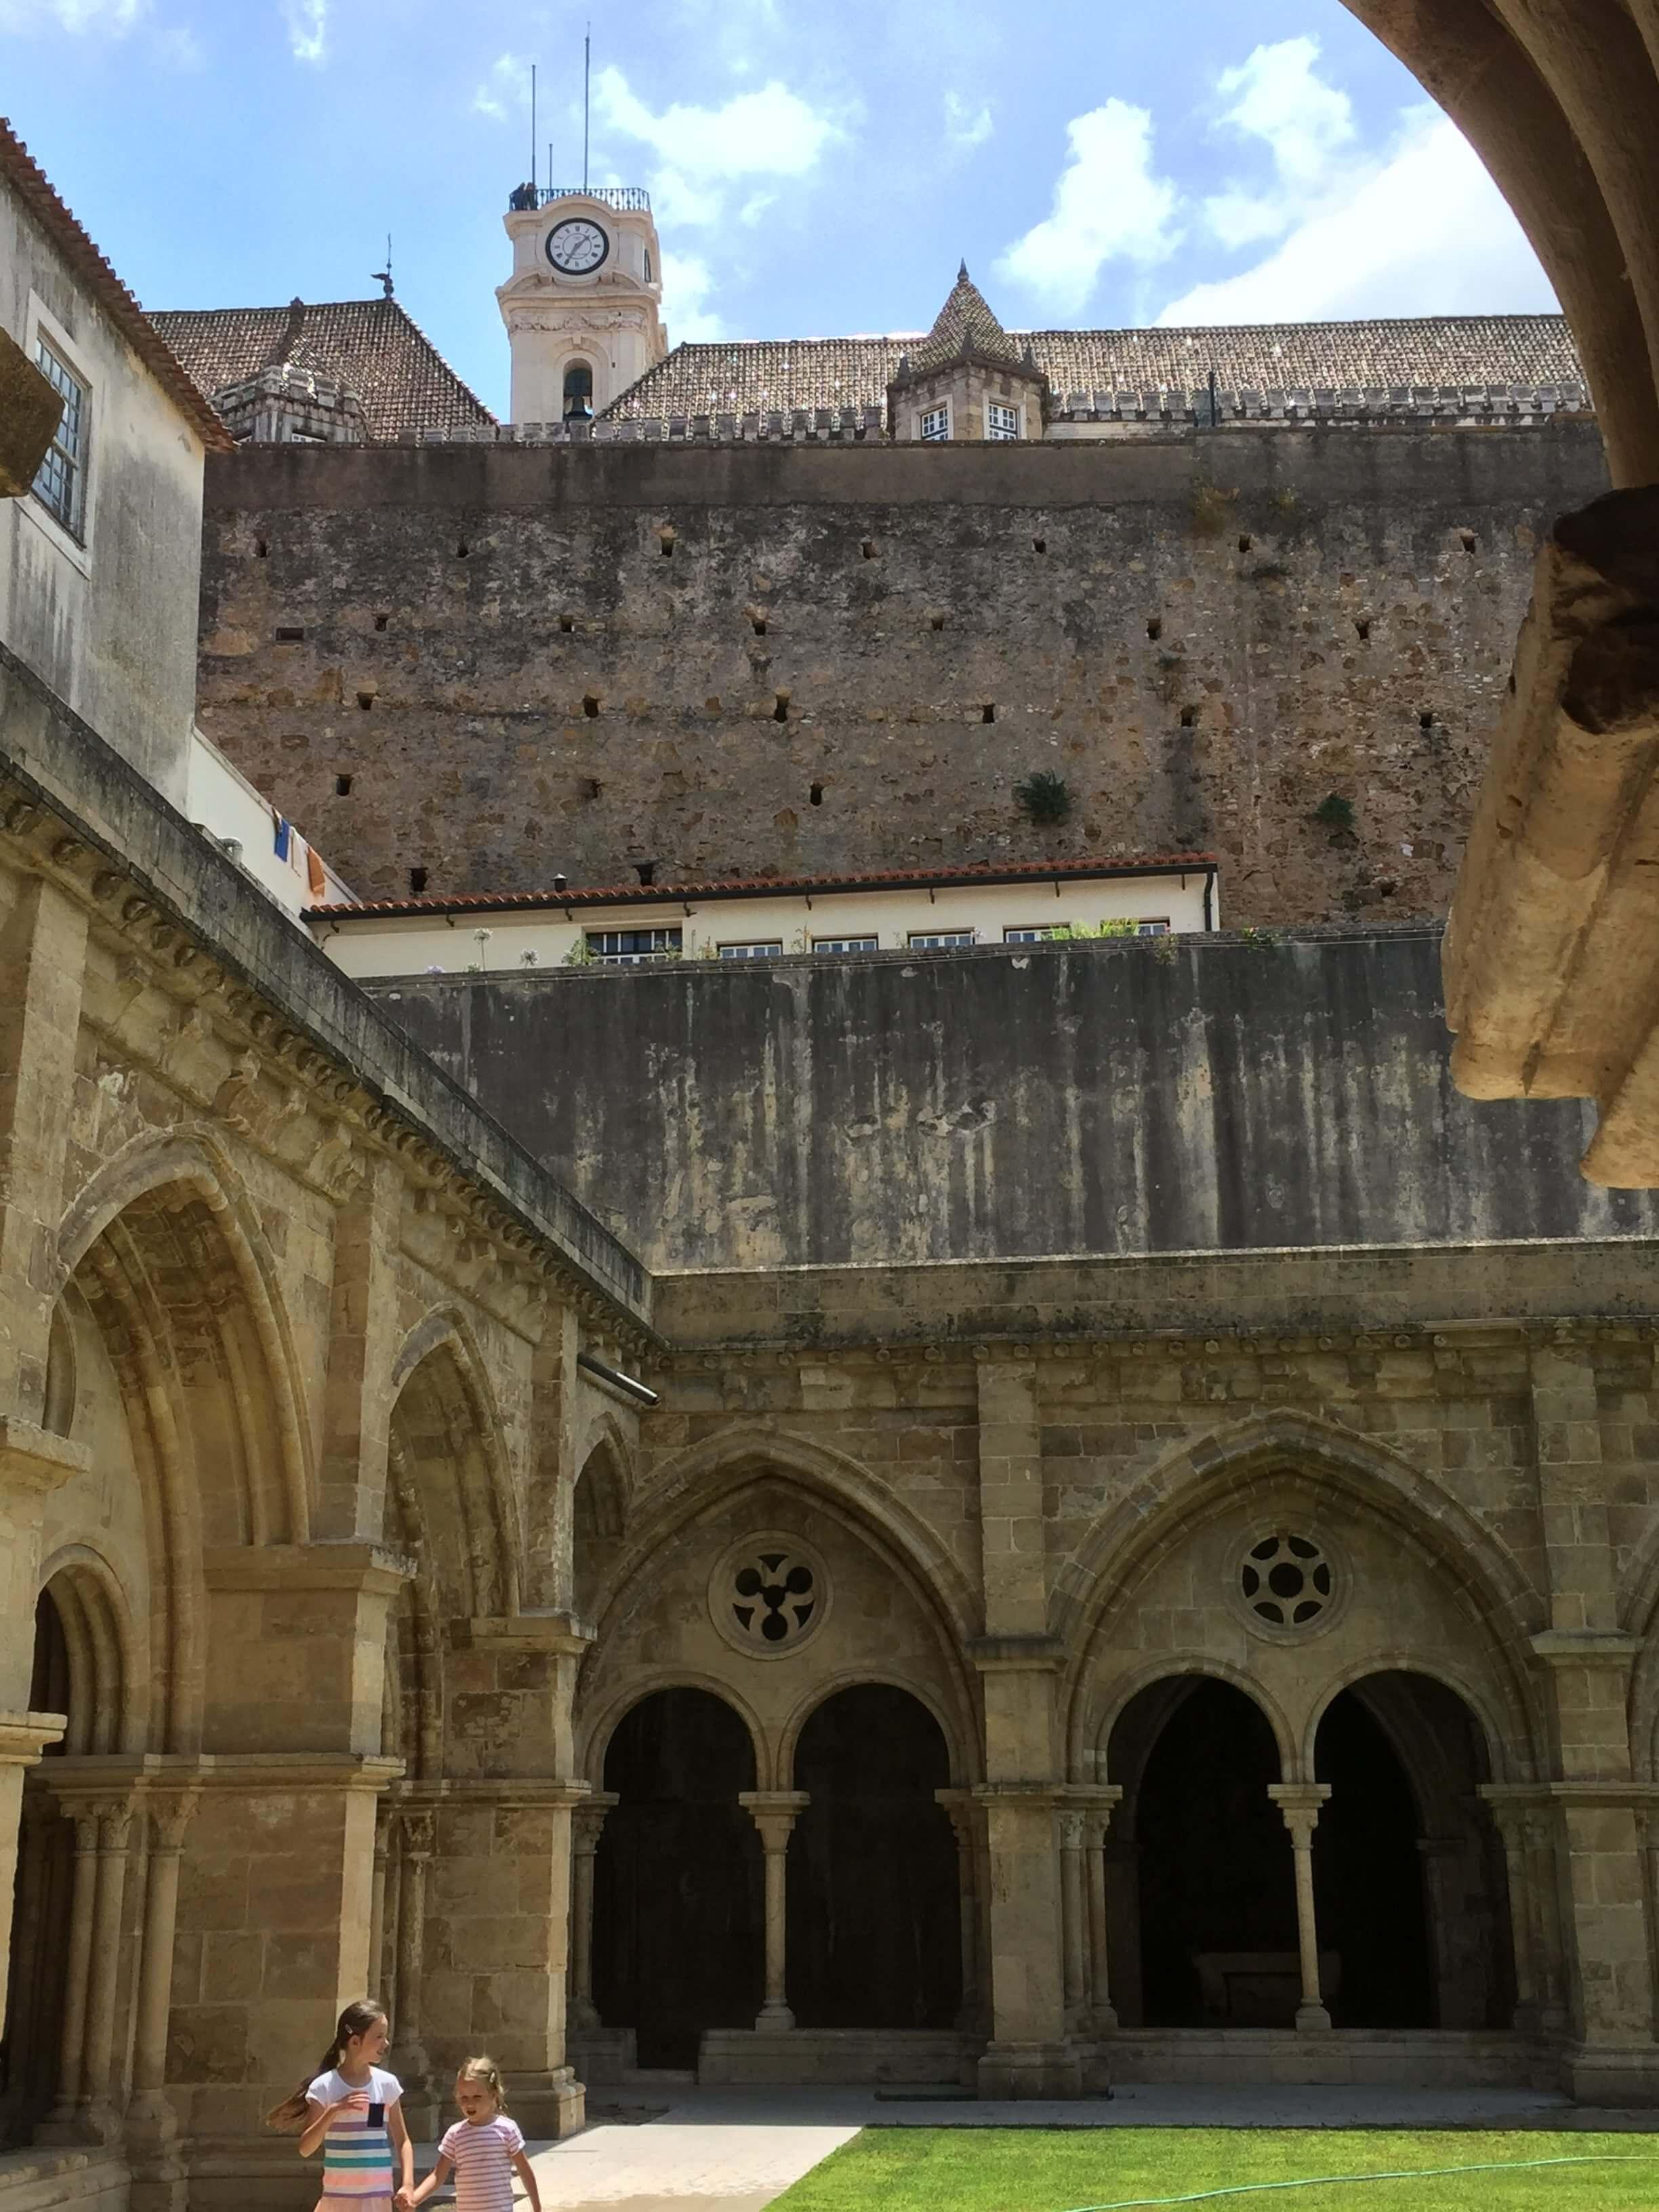 Rondreizen Portugal Coimbra Sé Velha met zich op universtiteit